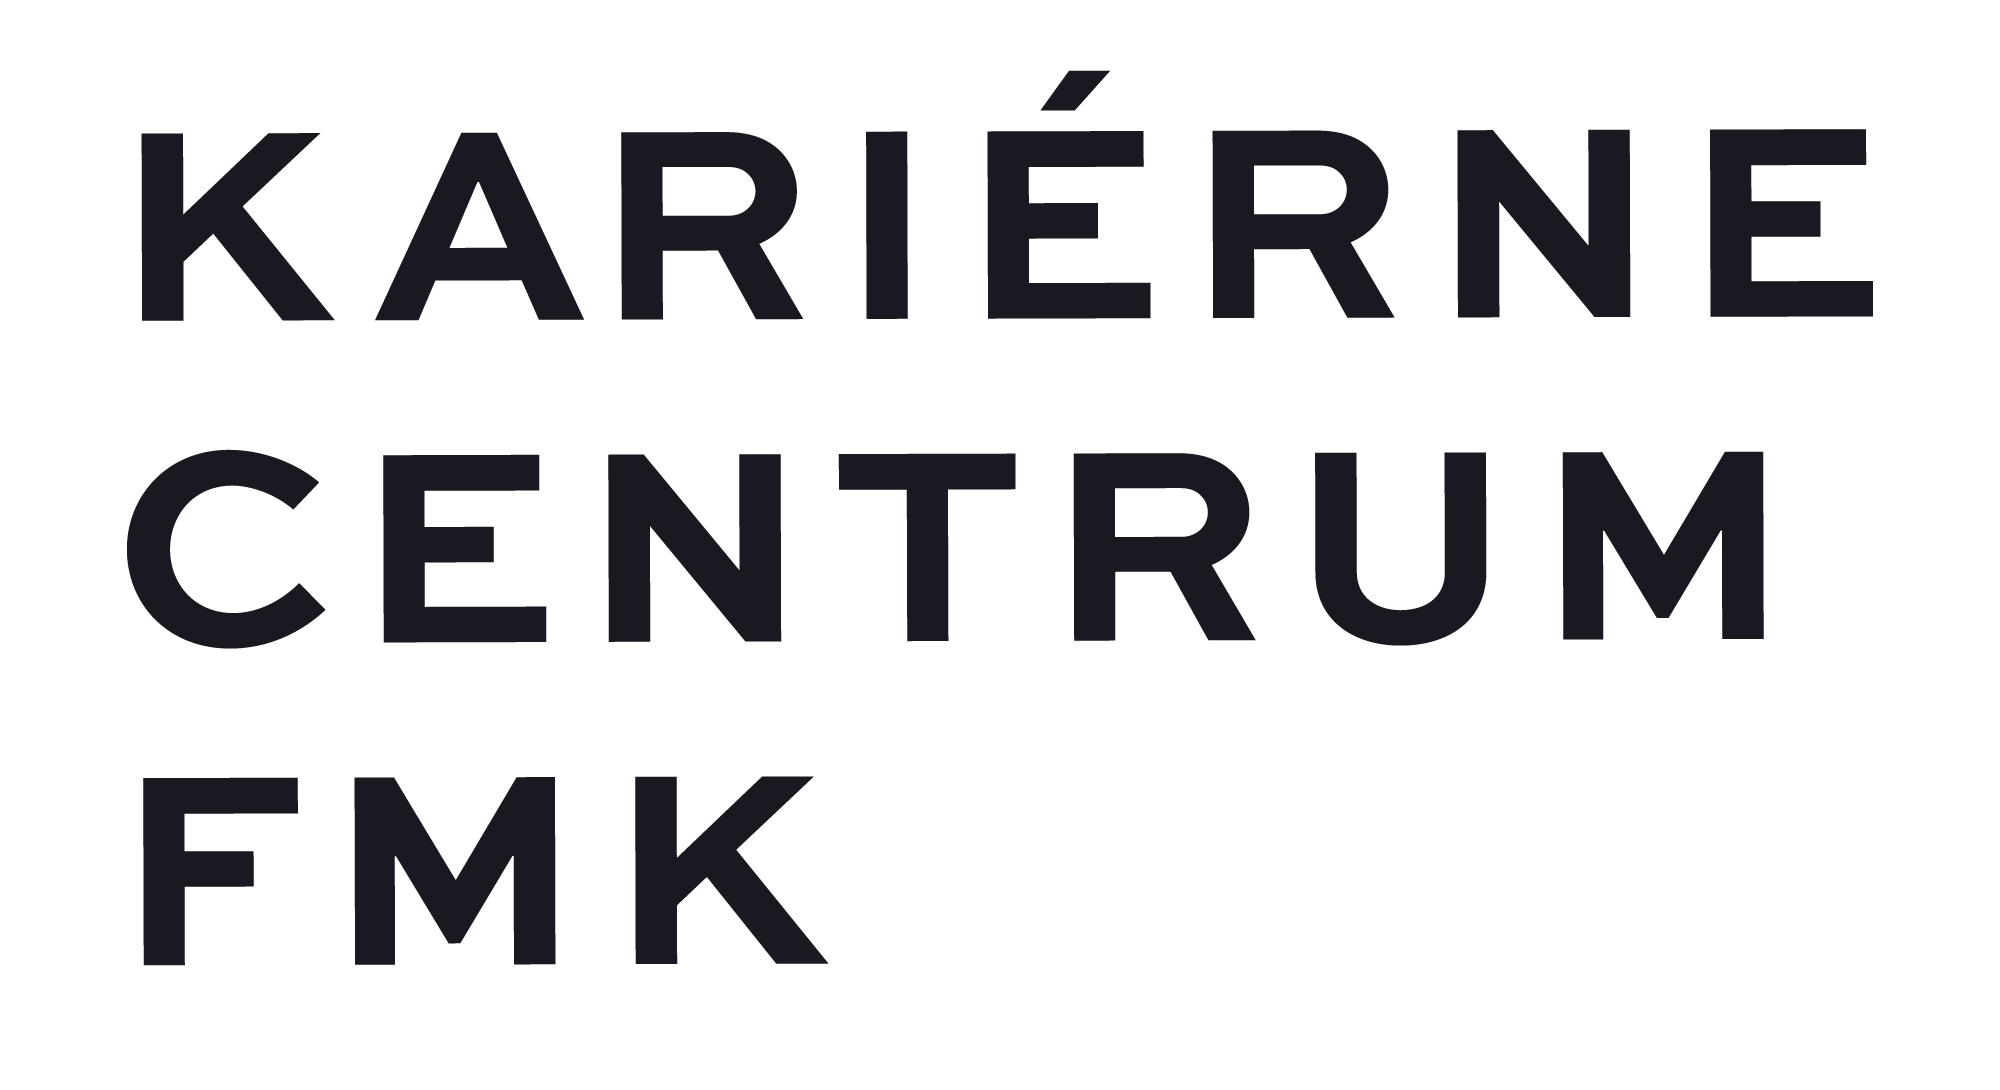 KARIÉRNE CENTRUM FMK